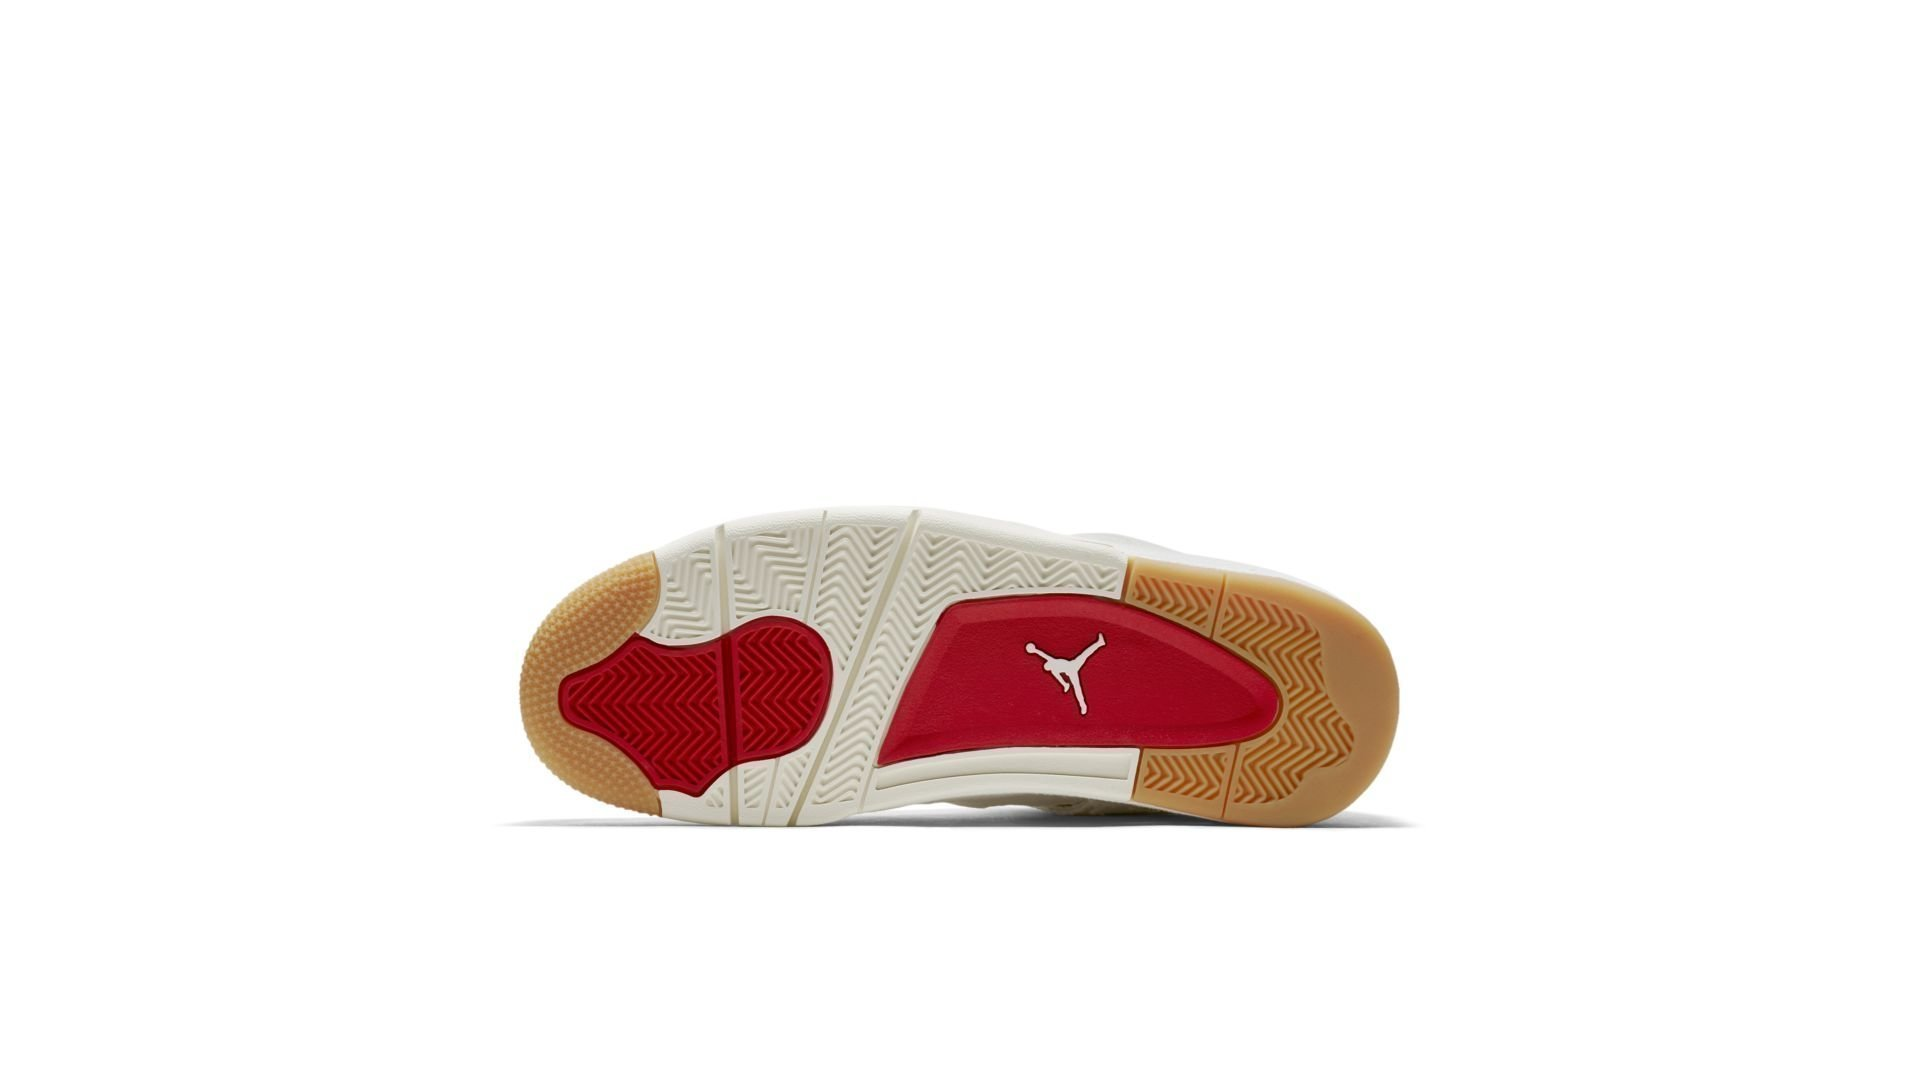 Jordan Brand Air Jordan 4 Retro Levis NRG 'White' (AO2571-100)